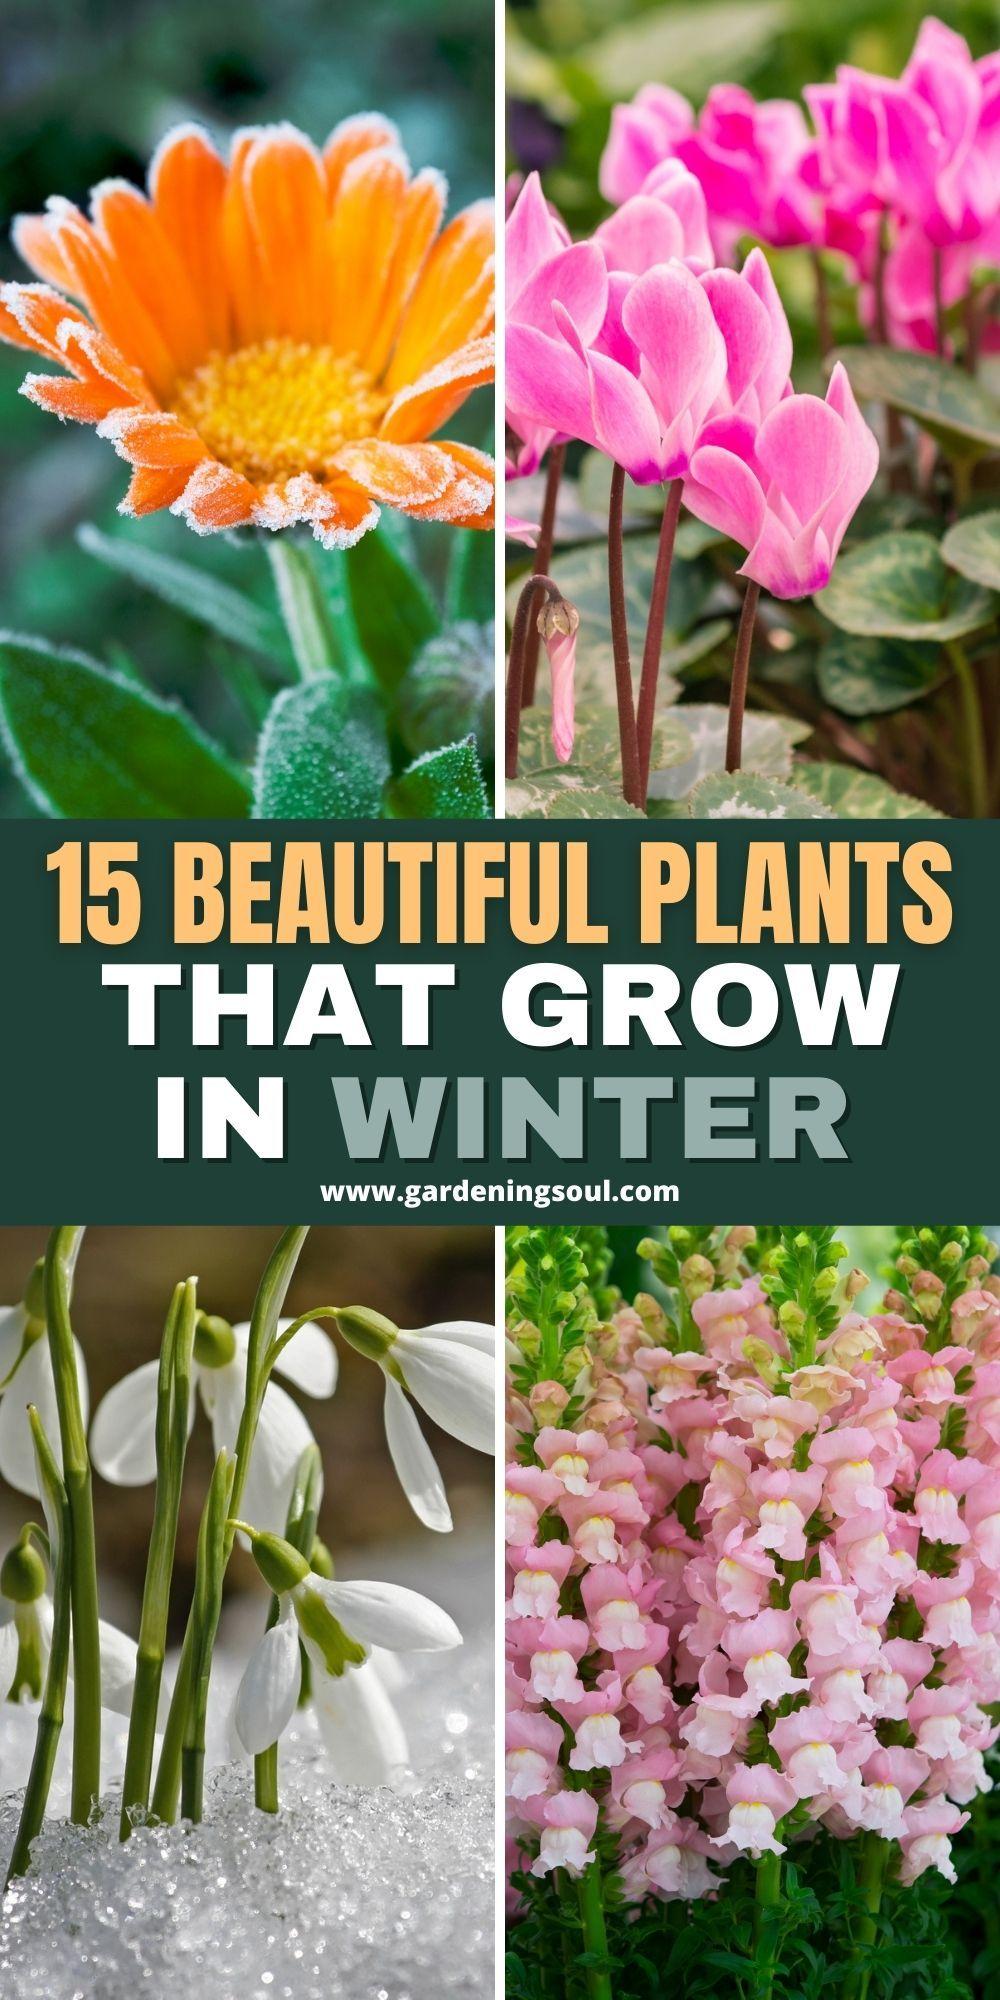 15 Beautiful Plants That Grow In Winter Winter Flowers Winter Flowers Garden Winter Garden